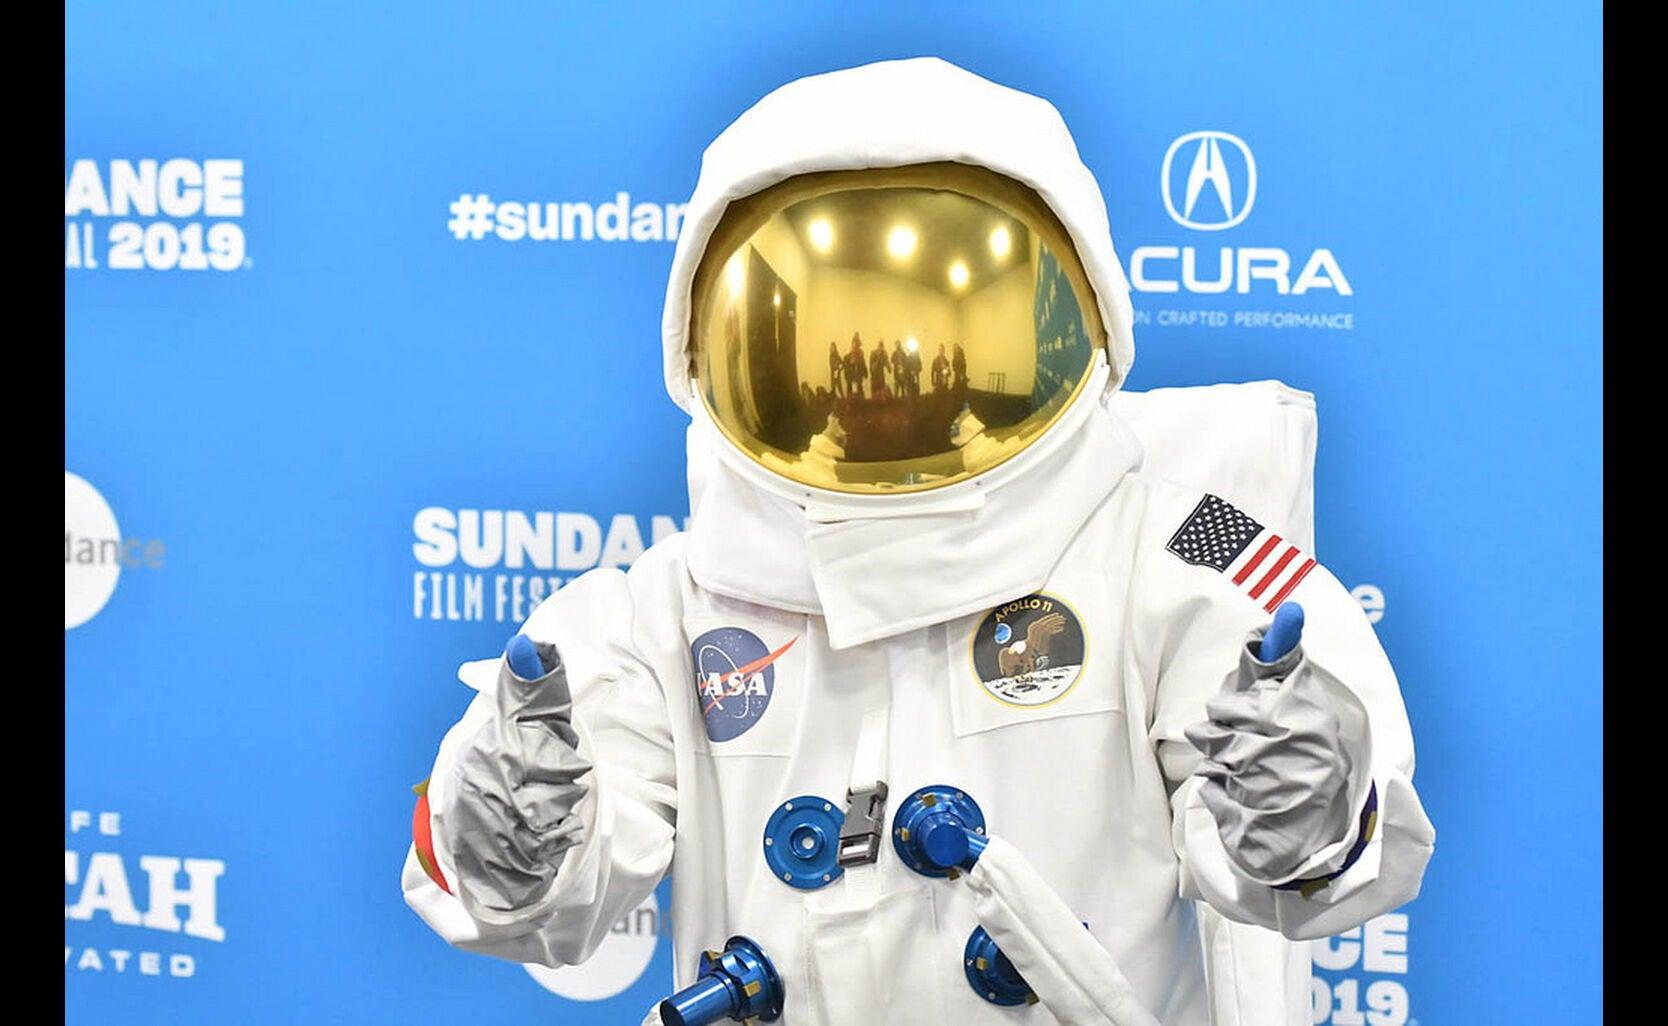 A special guest at the Apollo 11 premiere, Sundance2019